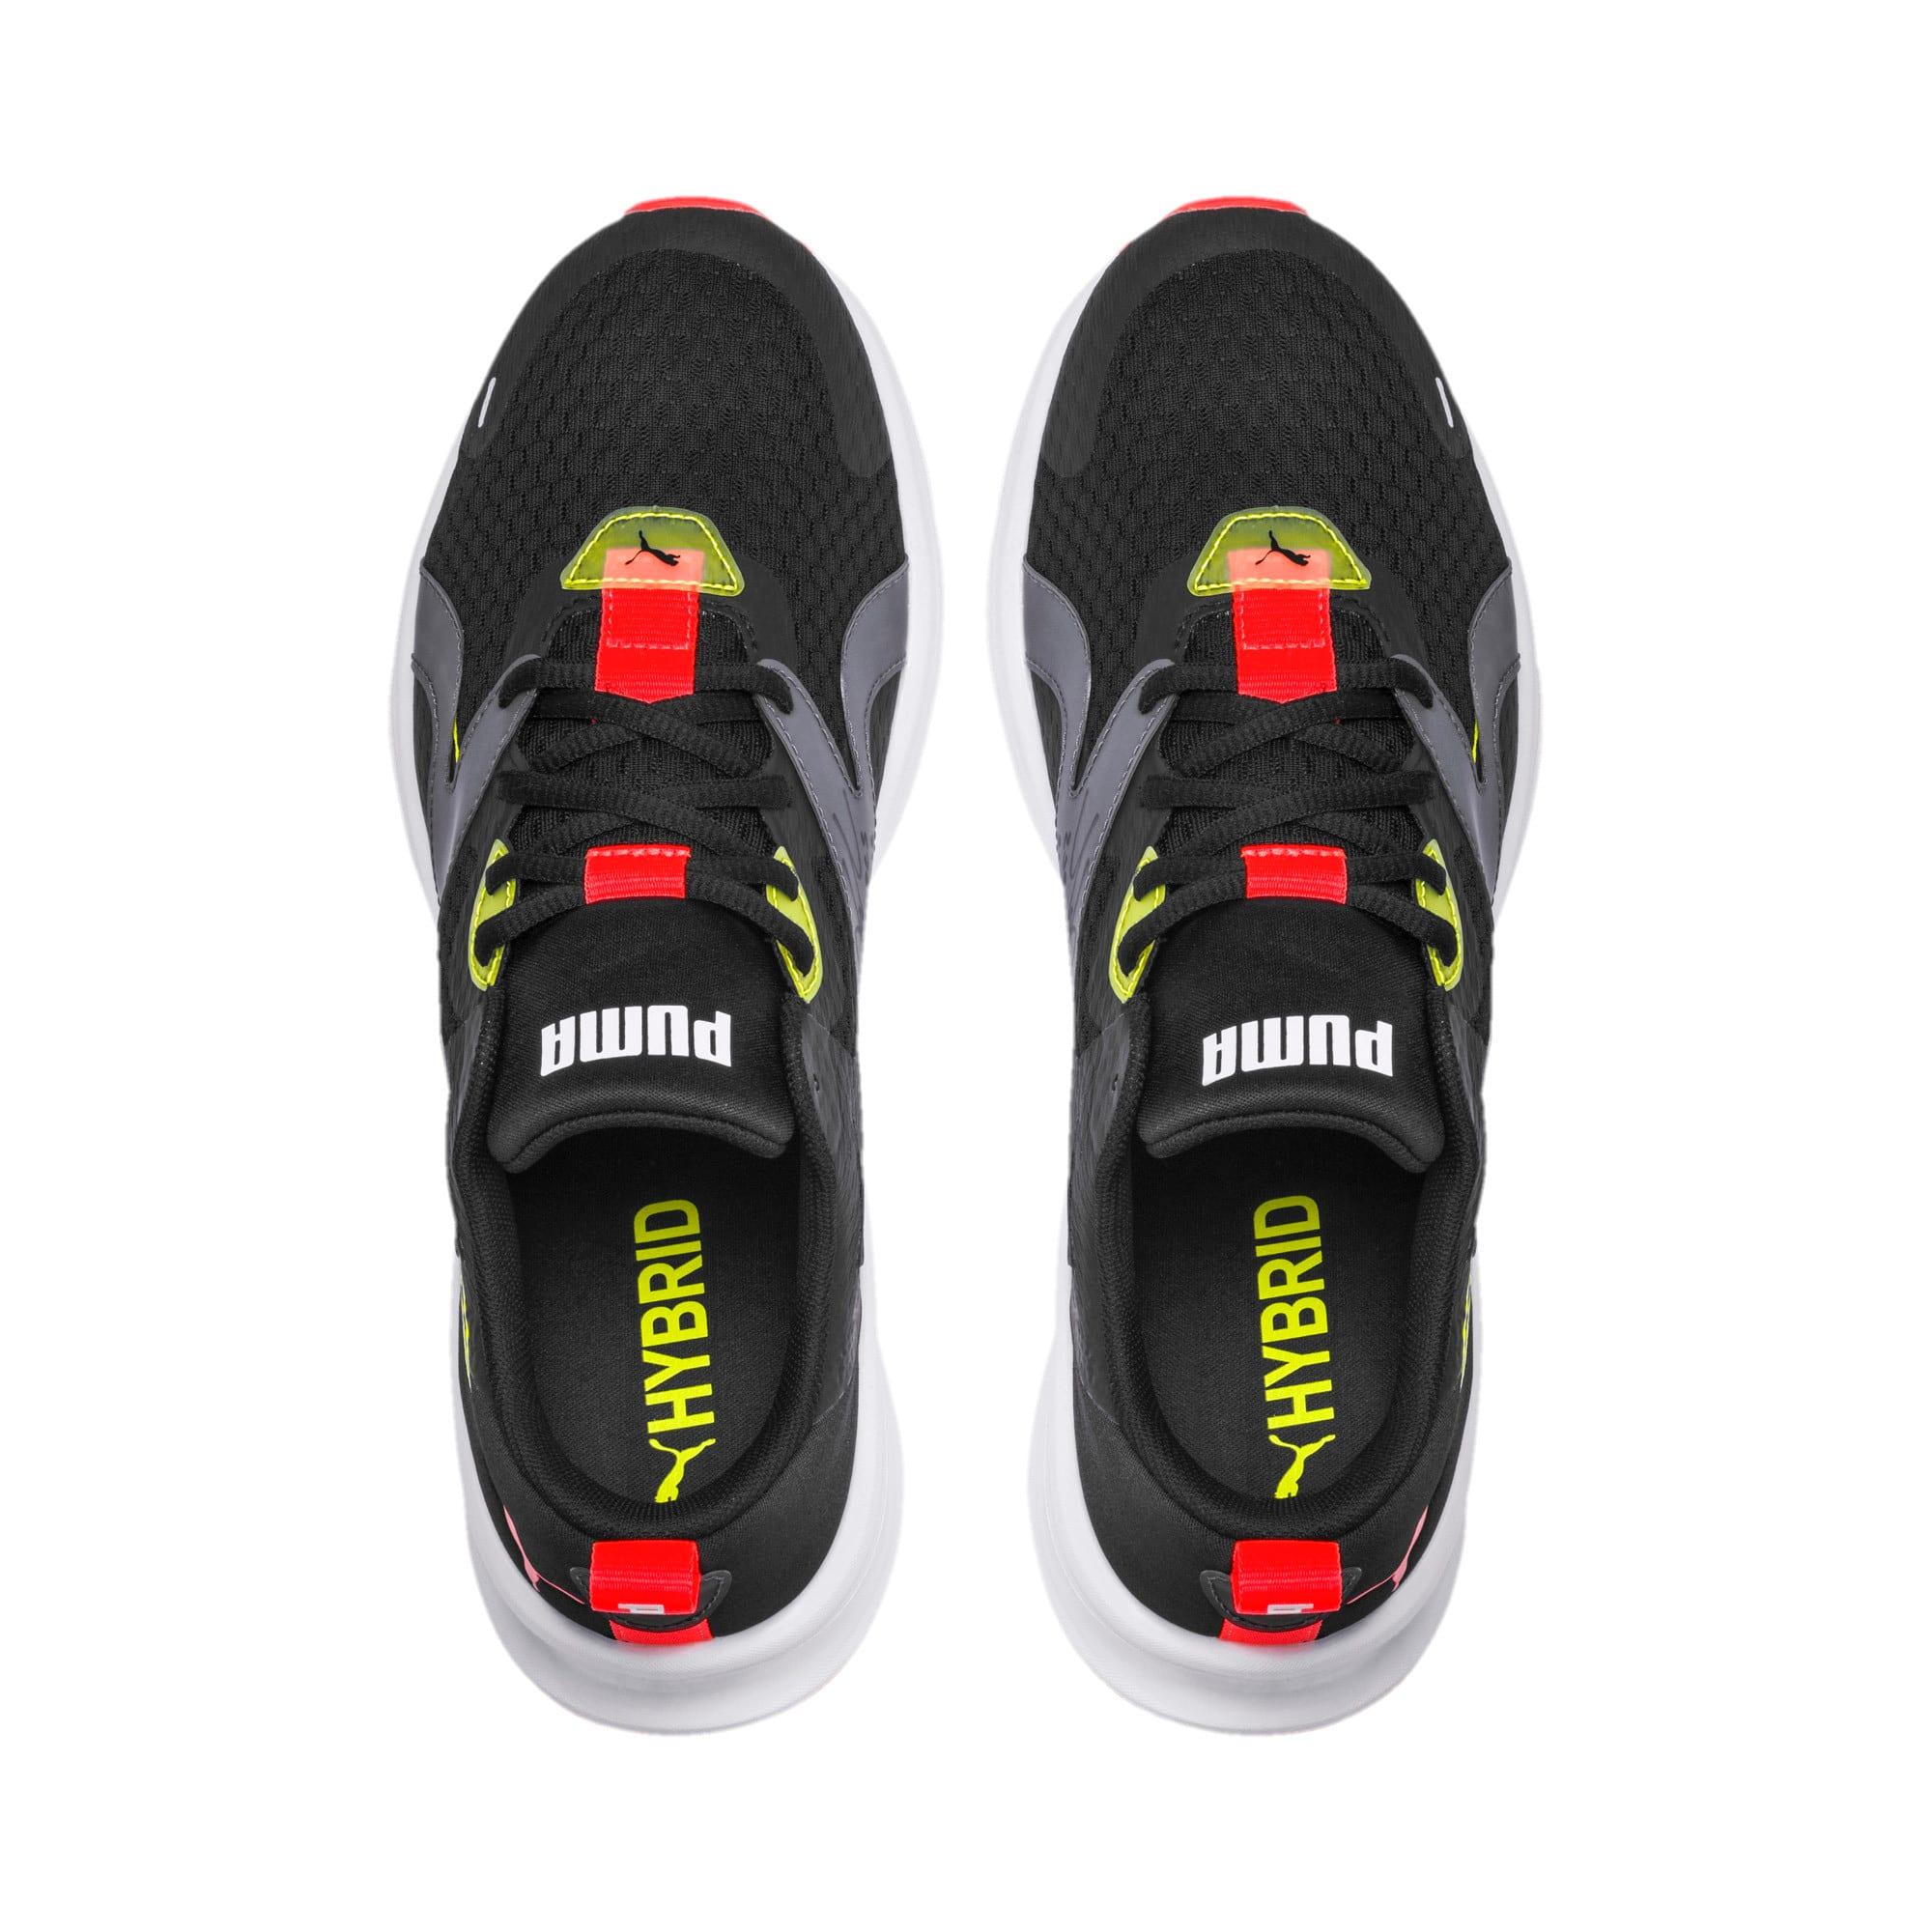 Thumbnail 6 of HYBRID Fuego Men's Running Shoes, Puma Black-Yellow Alert, medium